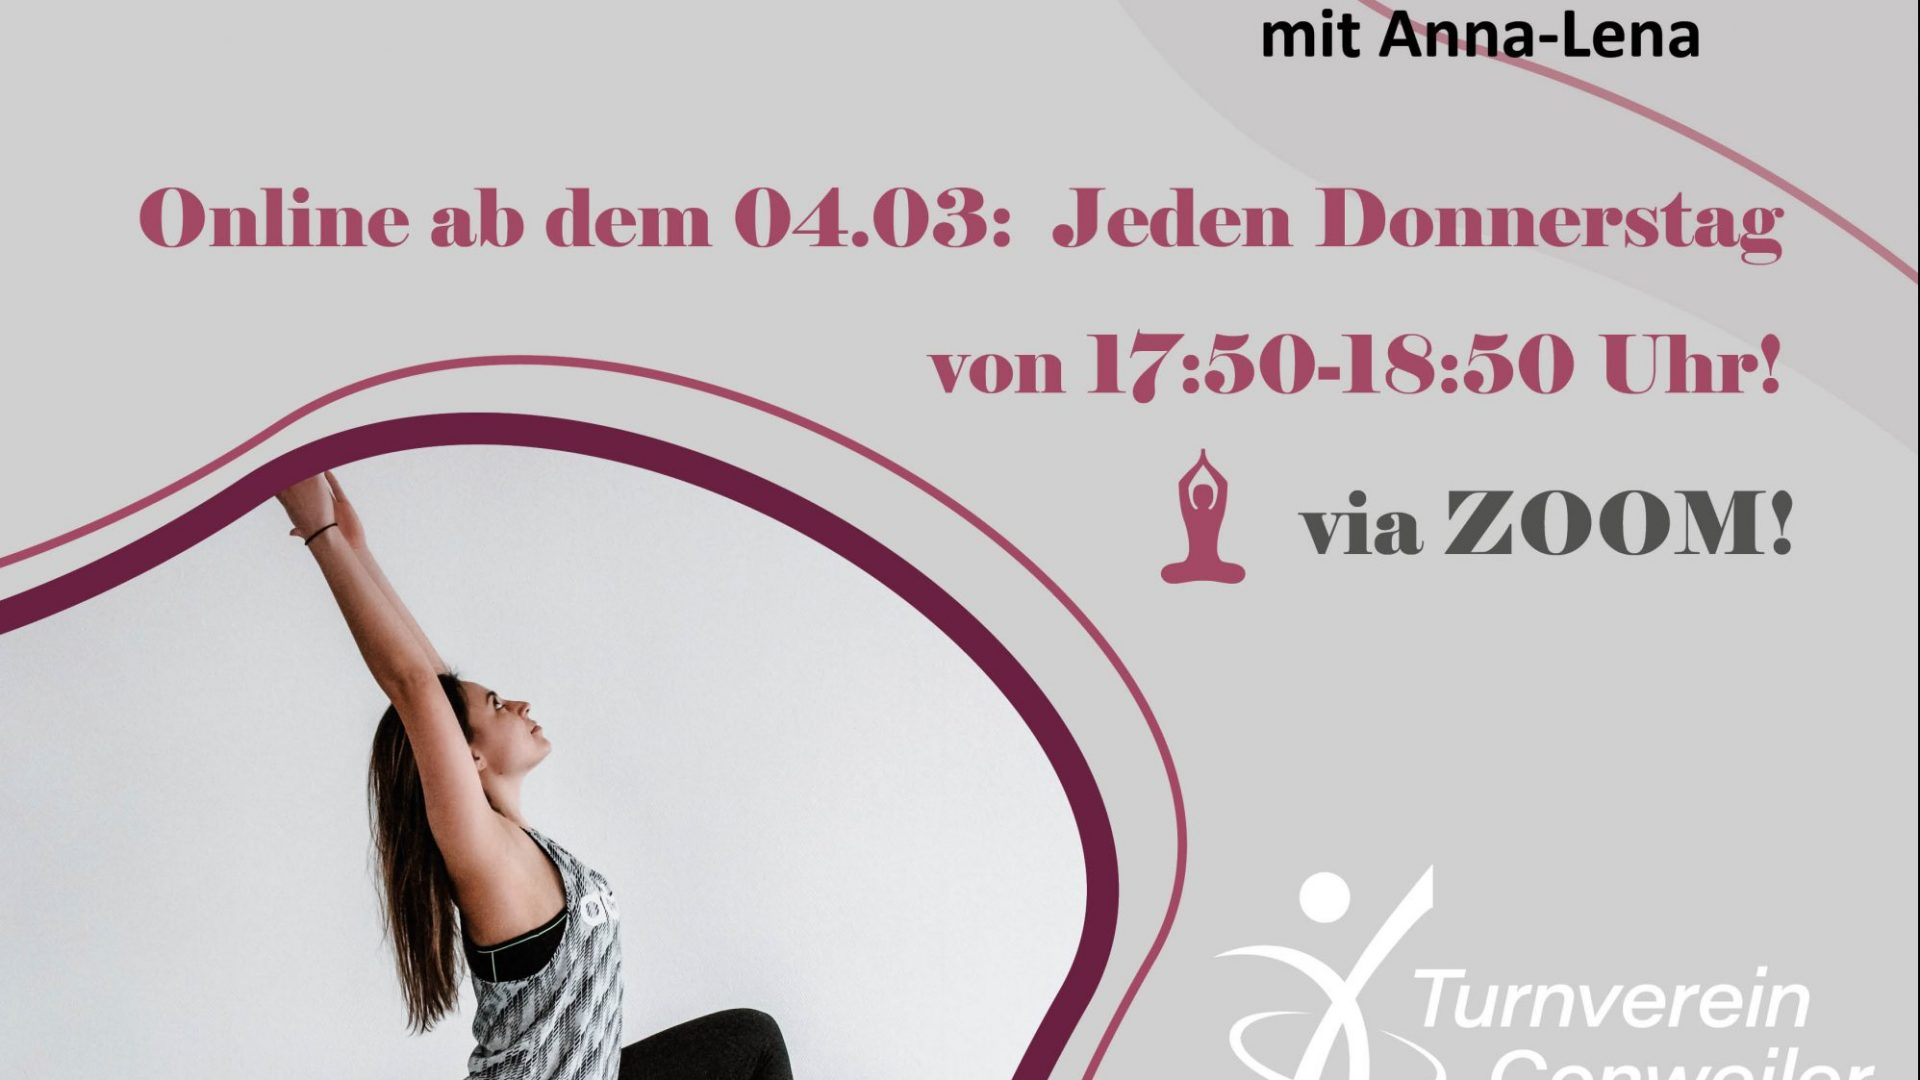 Neuer PILATES-Kurs mit Anna-Lena! Ab 04.03. Online!